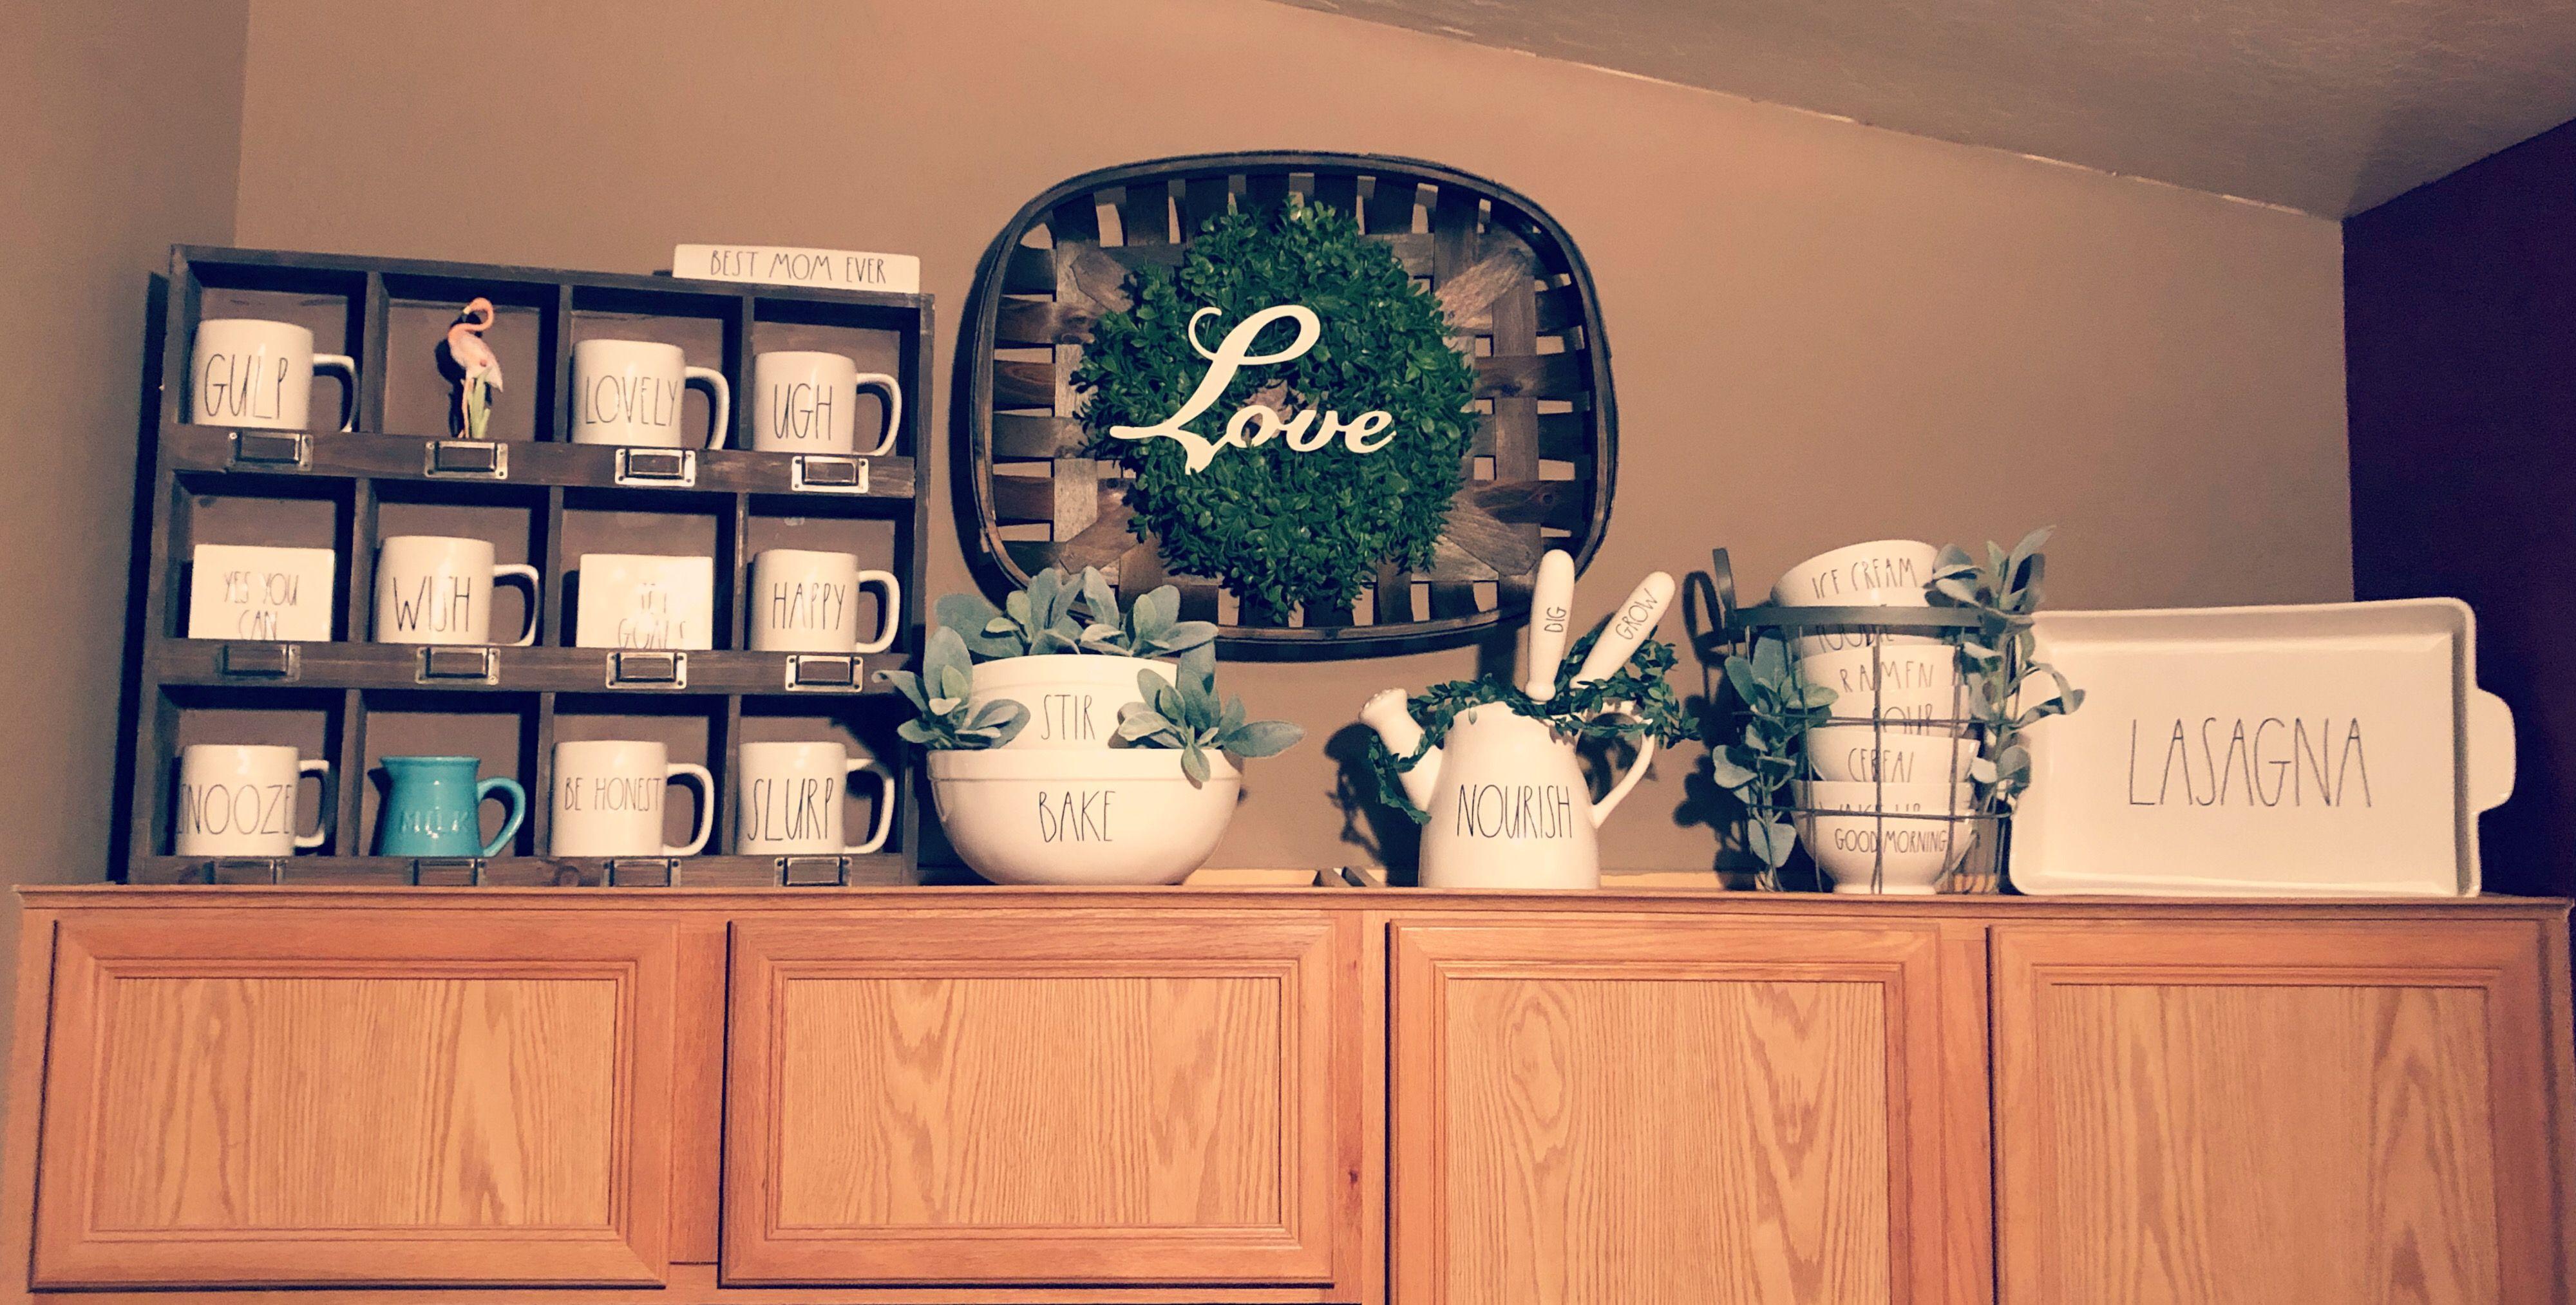 Rae Dunn Kitchen Cabinets Decor Top Of Kitchen Cabinets Top Of Kitchen Cabinets Decor